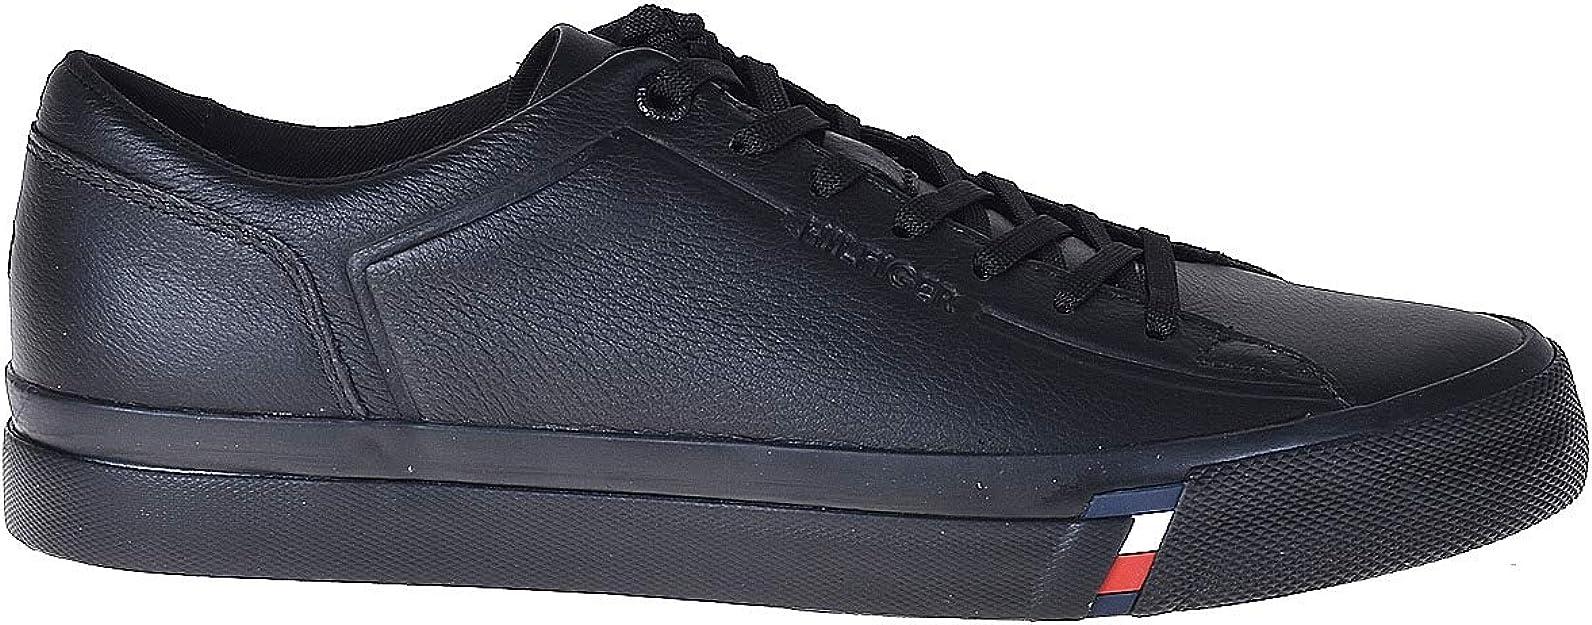 Tommy Hilfiger Corporate Leather Sneaker, Scarpe da Ginnastica Basse Uomo